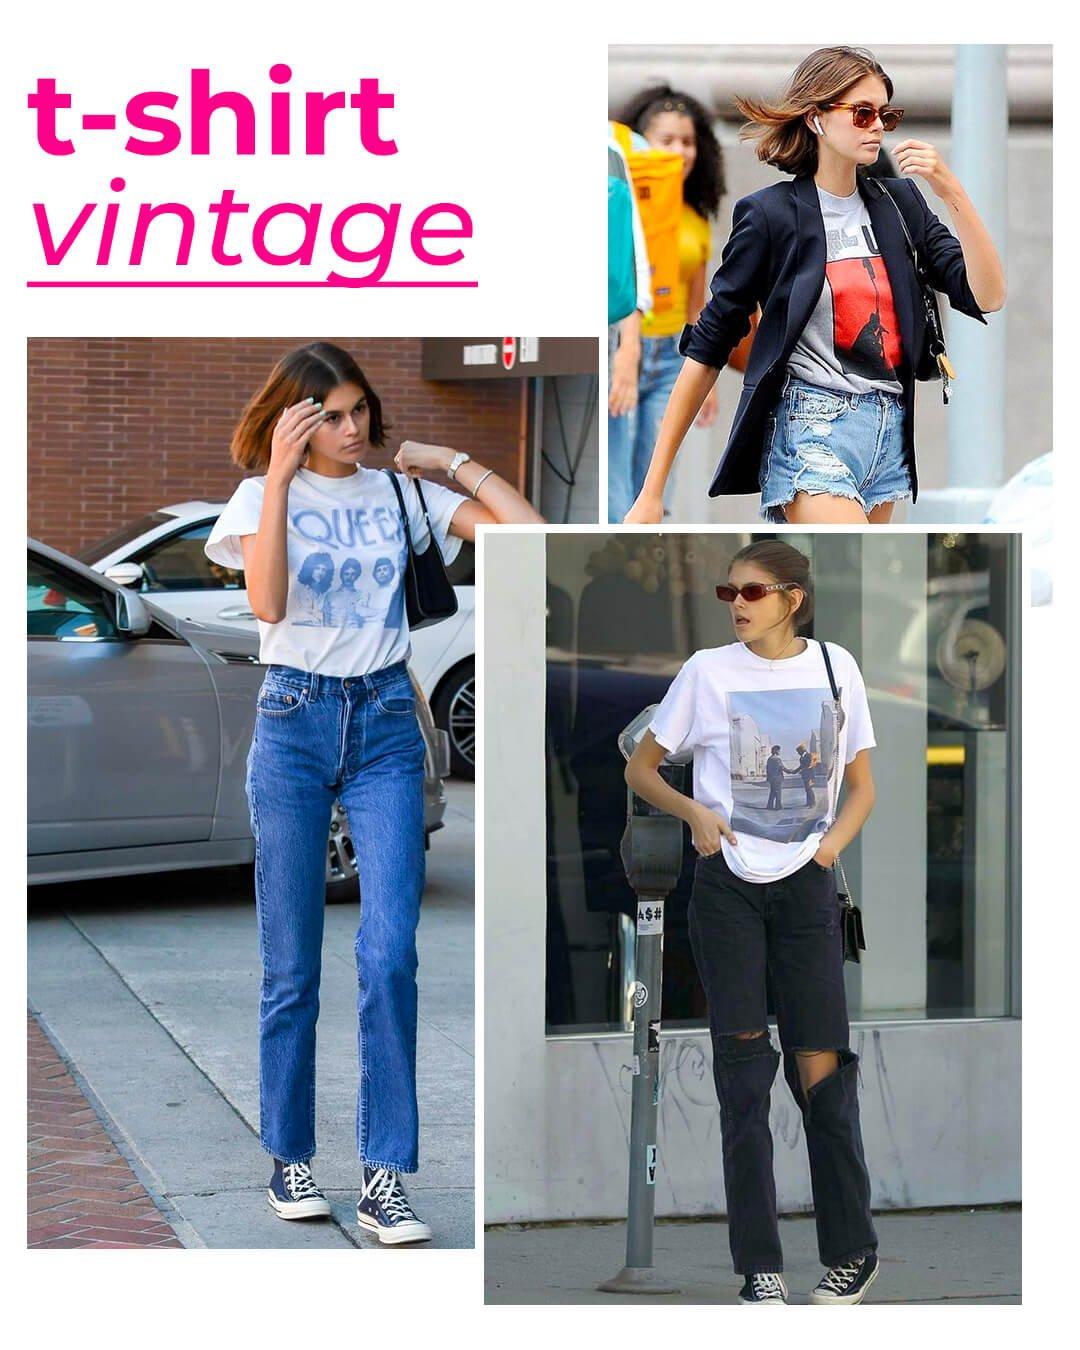 Kaia Gerber - T-shirt vintage - T-shirt - Verão - Street Style - https://stealthelook.com.br